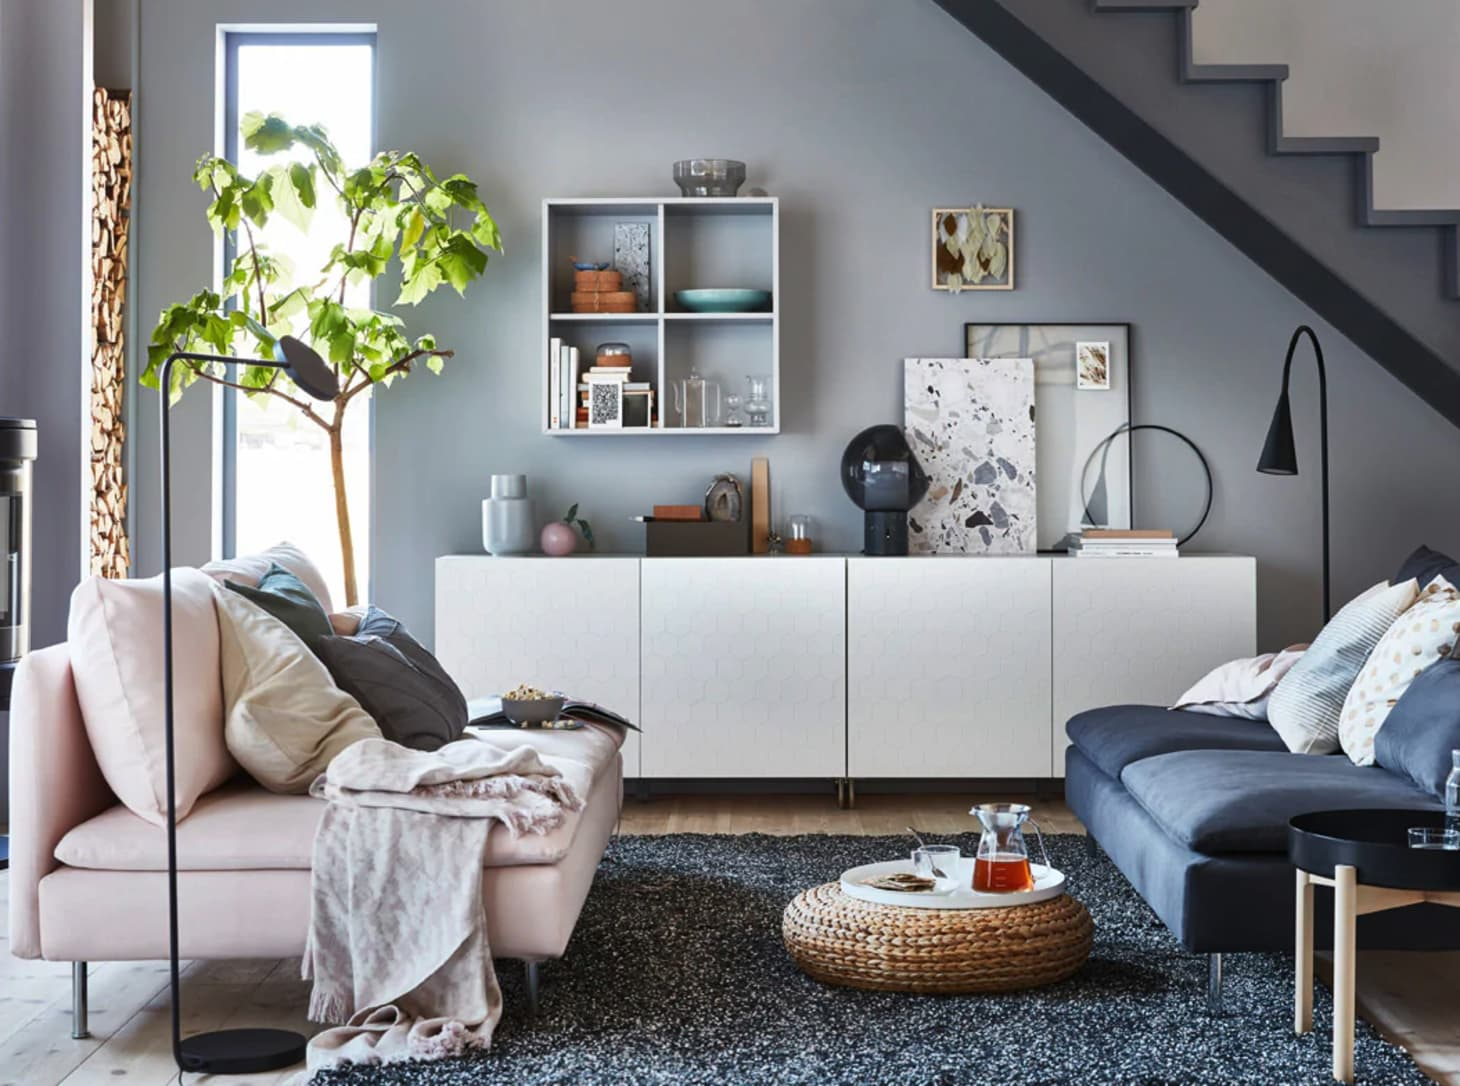 Ikea Living Room >> Cozy Ikea Living Room Design Ideas Ikea Living Rooms